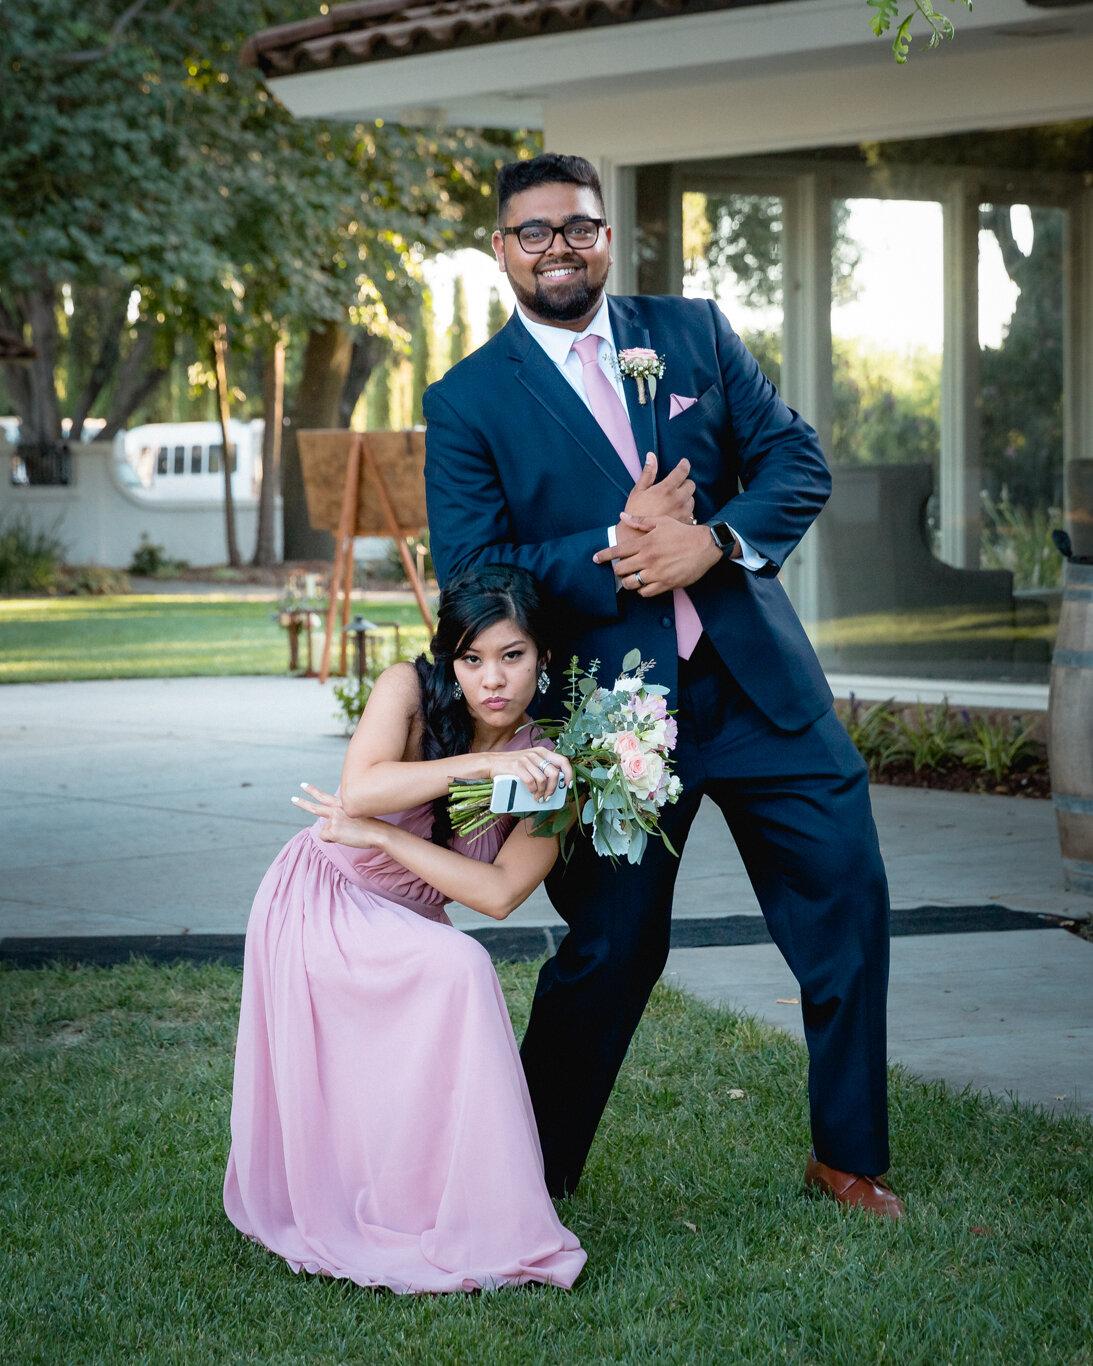 2019.08.24_Emily-Ashir-Wedding-at-the-Maples-6132.jpg